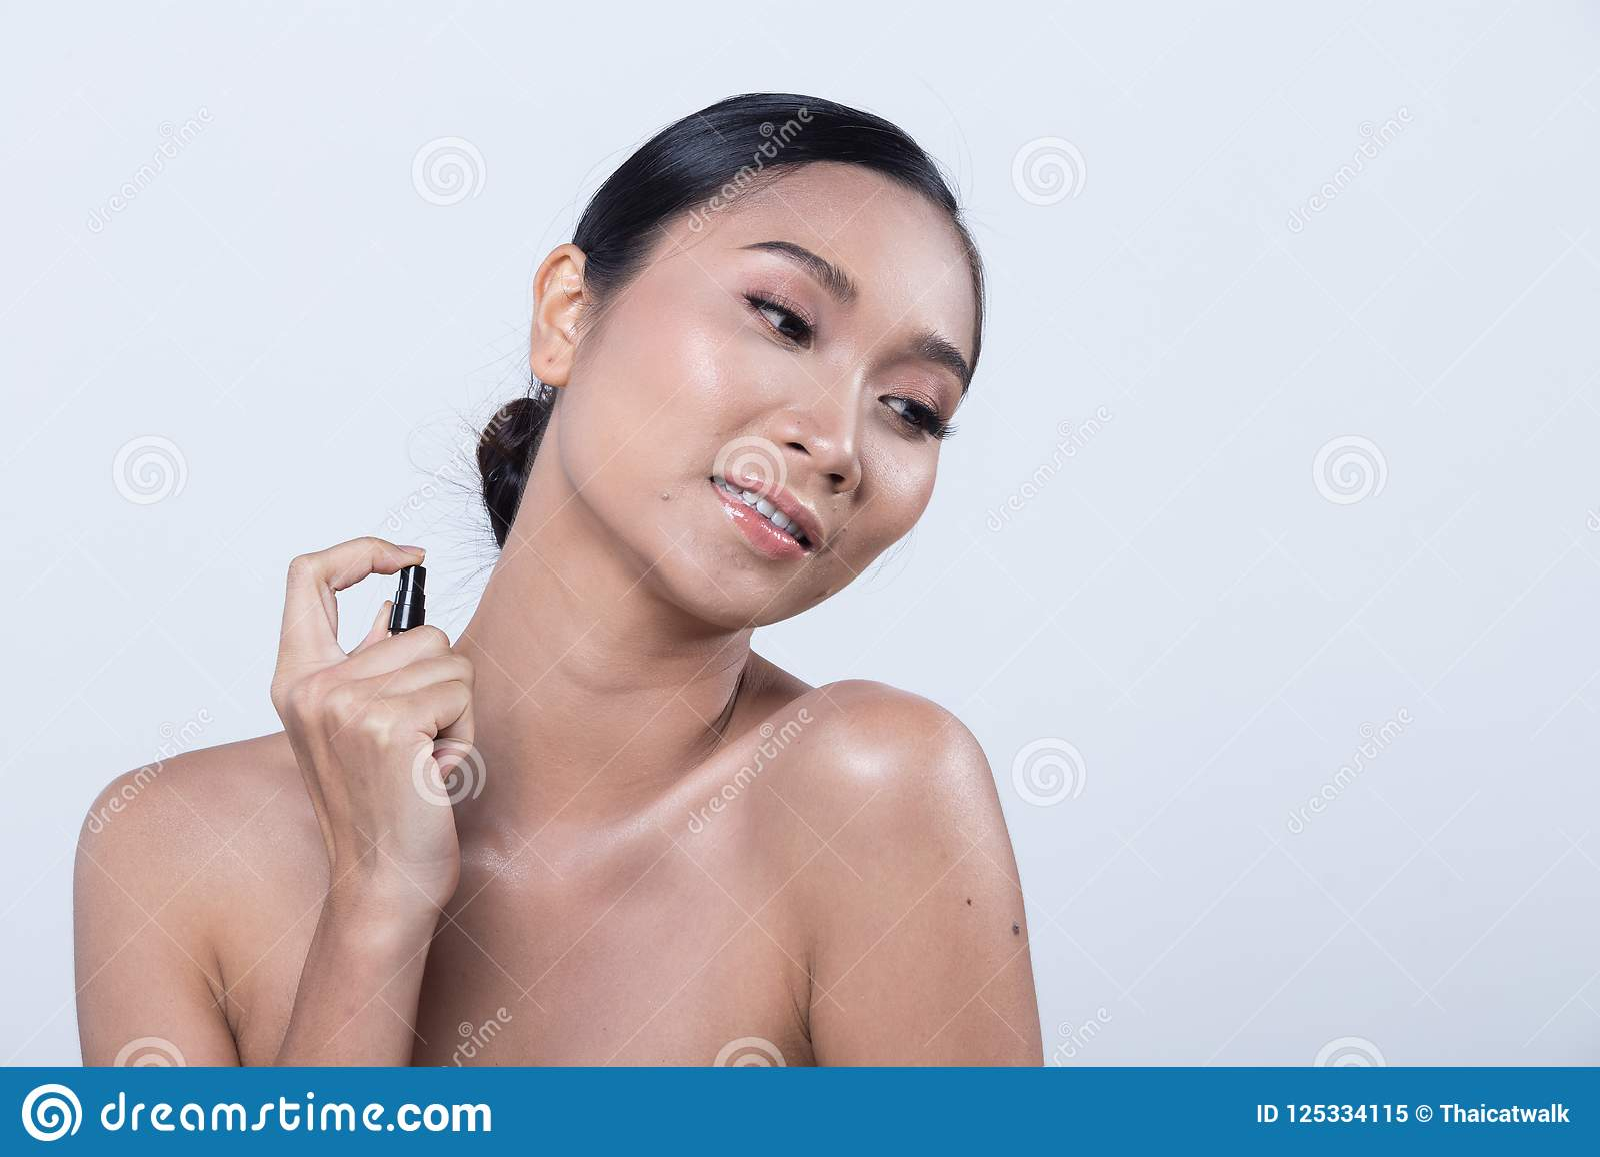 Asian Straighty Sprayed